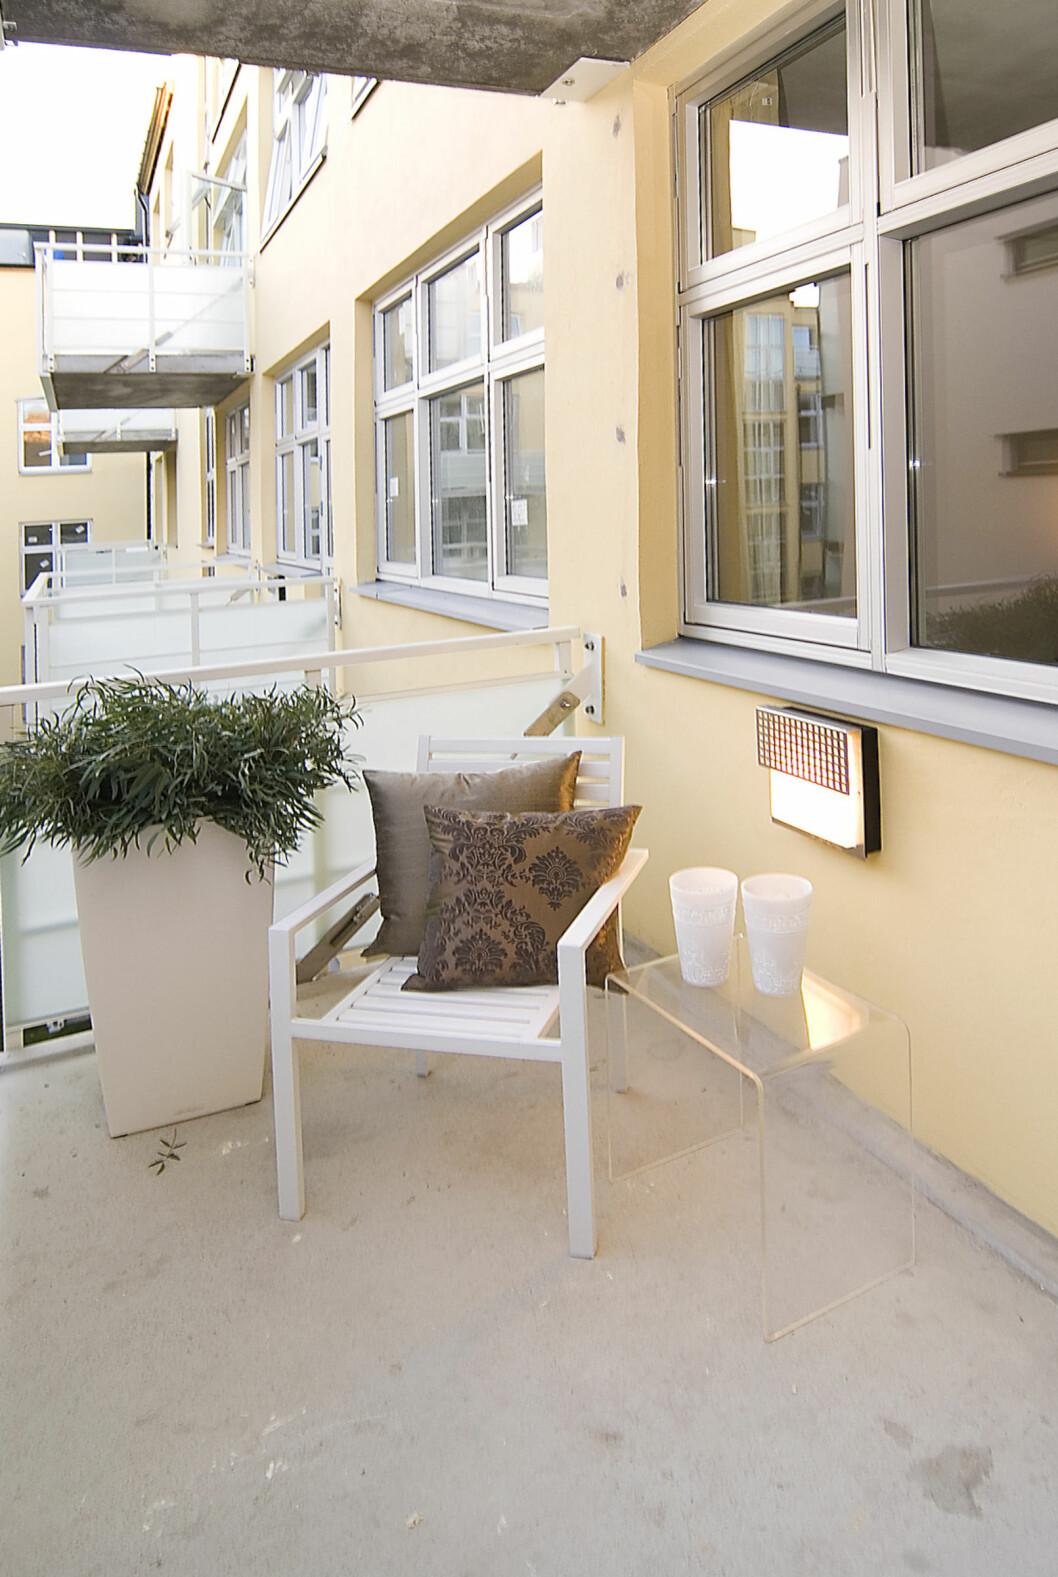 Balkongen stylet av Interior Deal AS. Foto: Foto: Garanti Eiendomsmegling